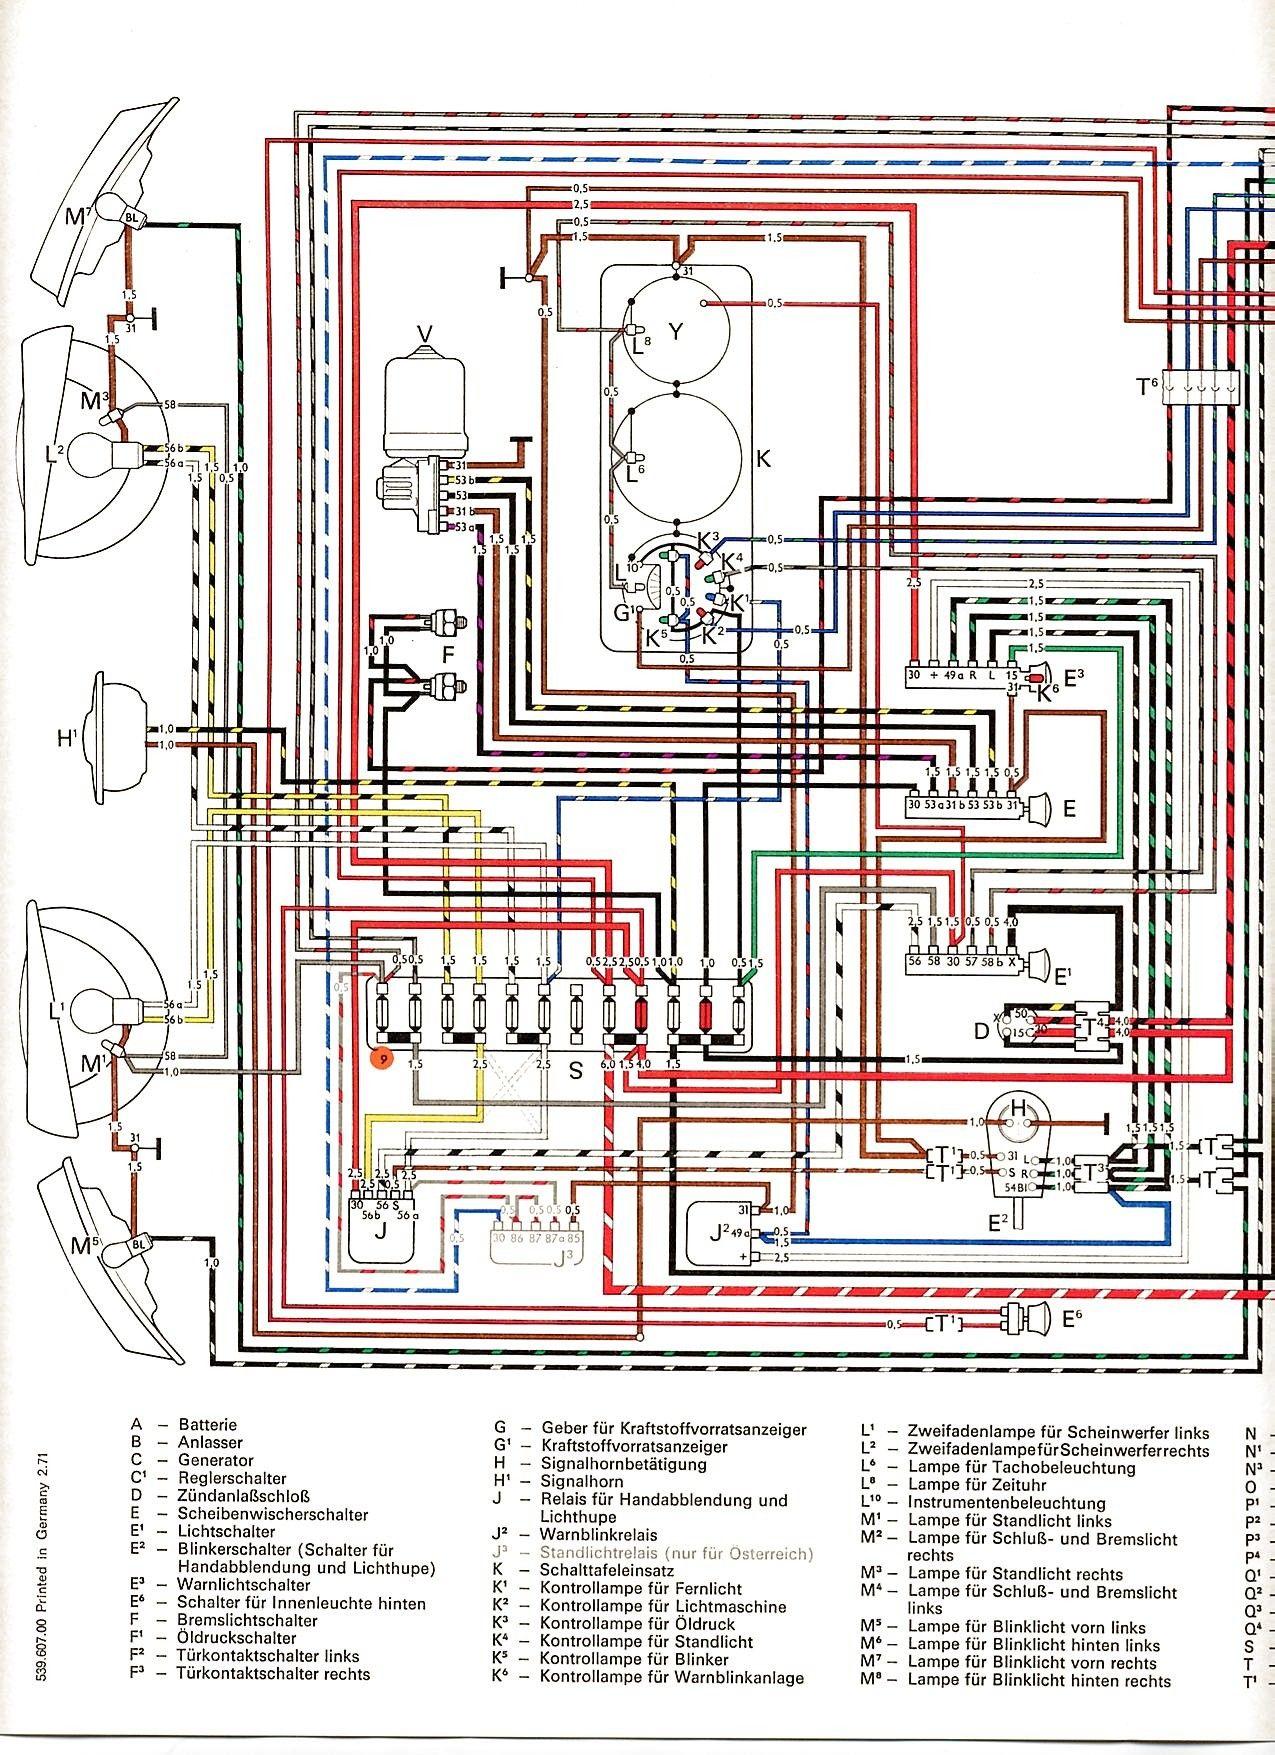 Unique Free Wiring Diagrams.com #diagram #wiringdiagram #diagramming  #Diagramm #visuals #visualisation #graphical | Vw beetle classic, Diagram,  Engine repairPinterest